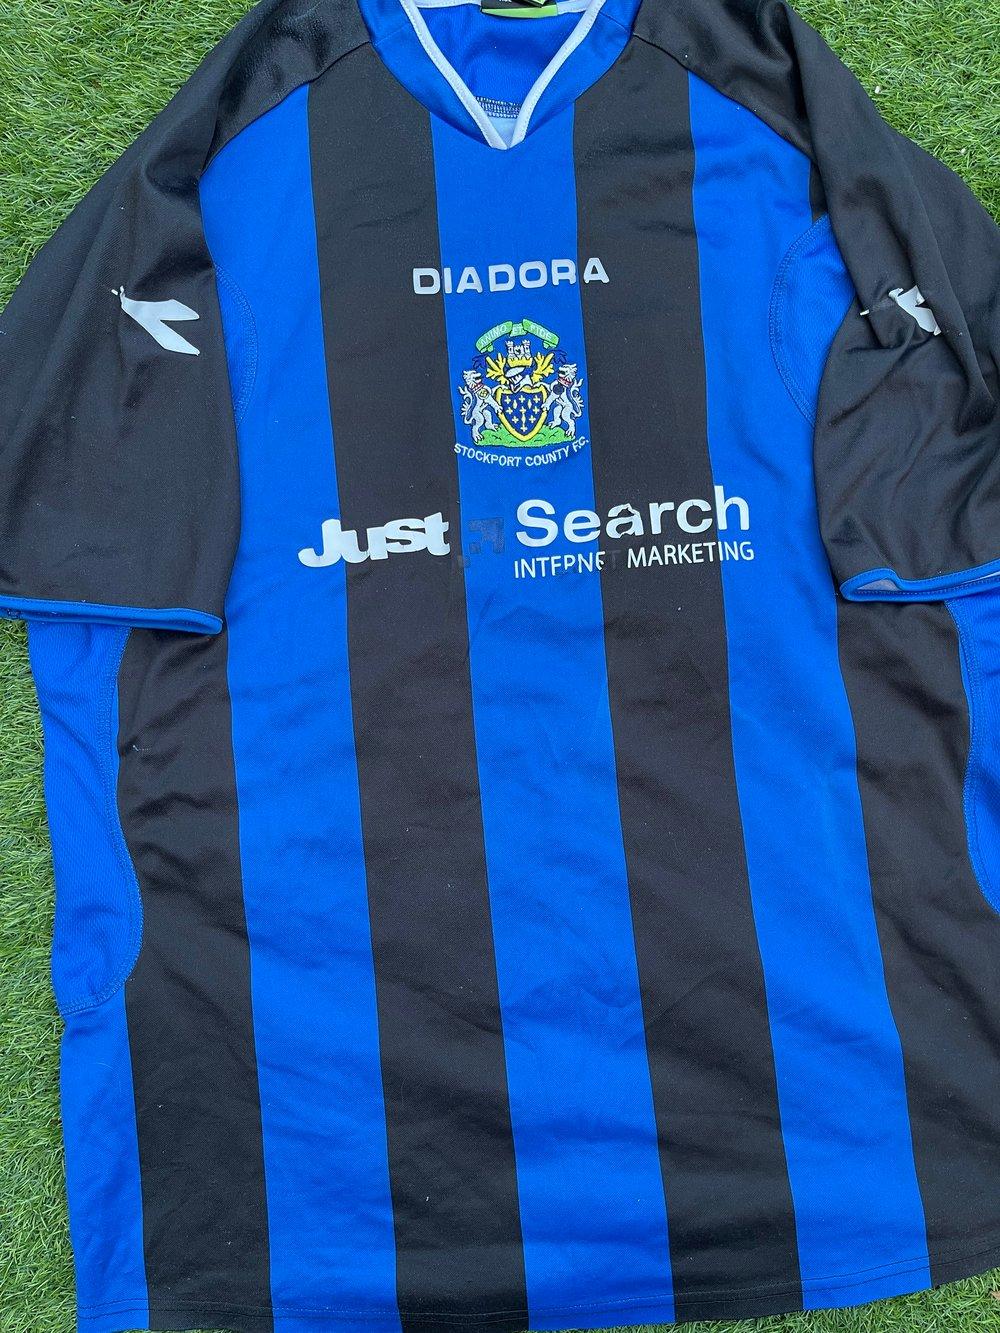 Match Worn 2007 Diadora Pre-Season Shirt